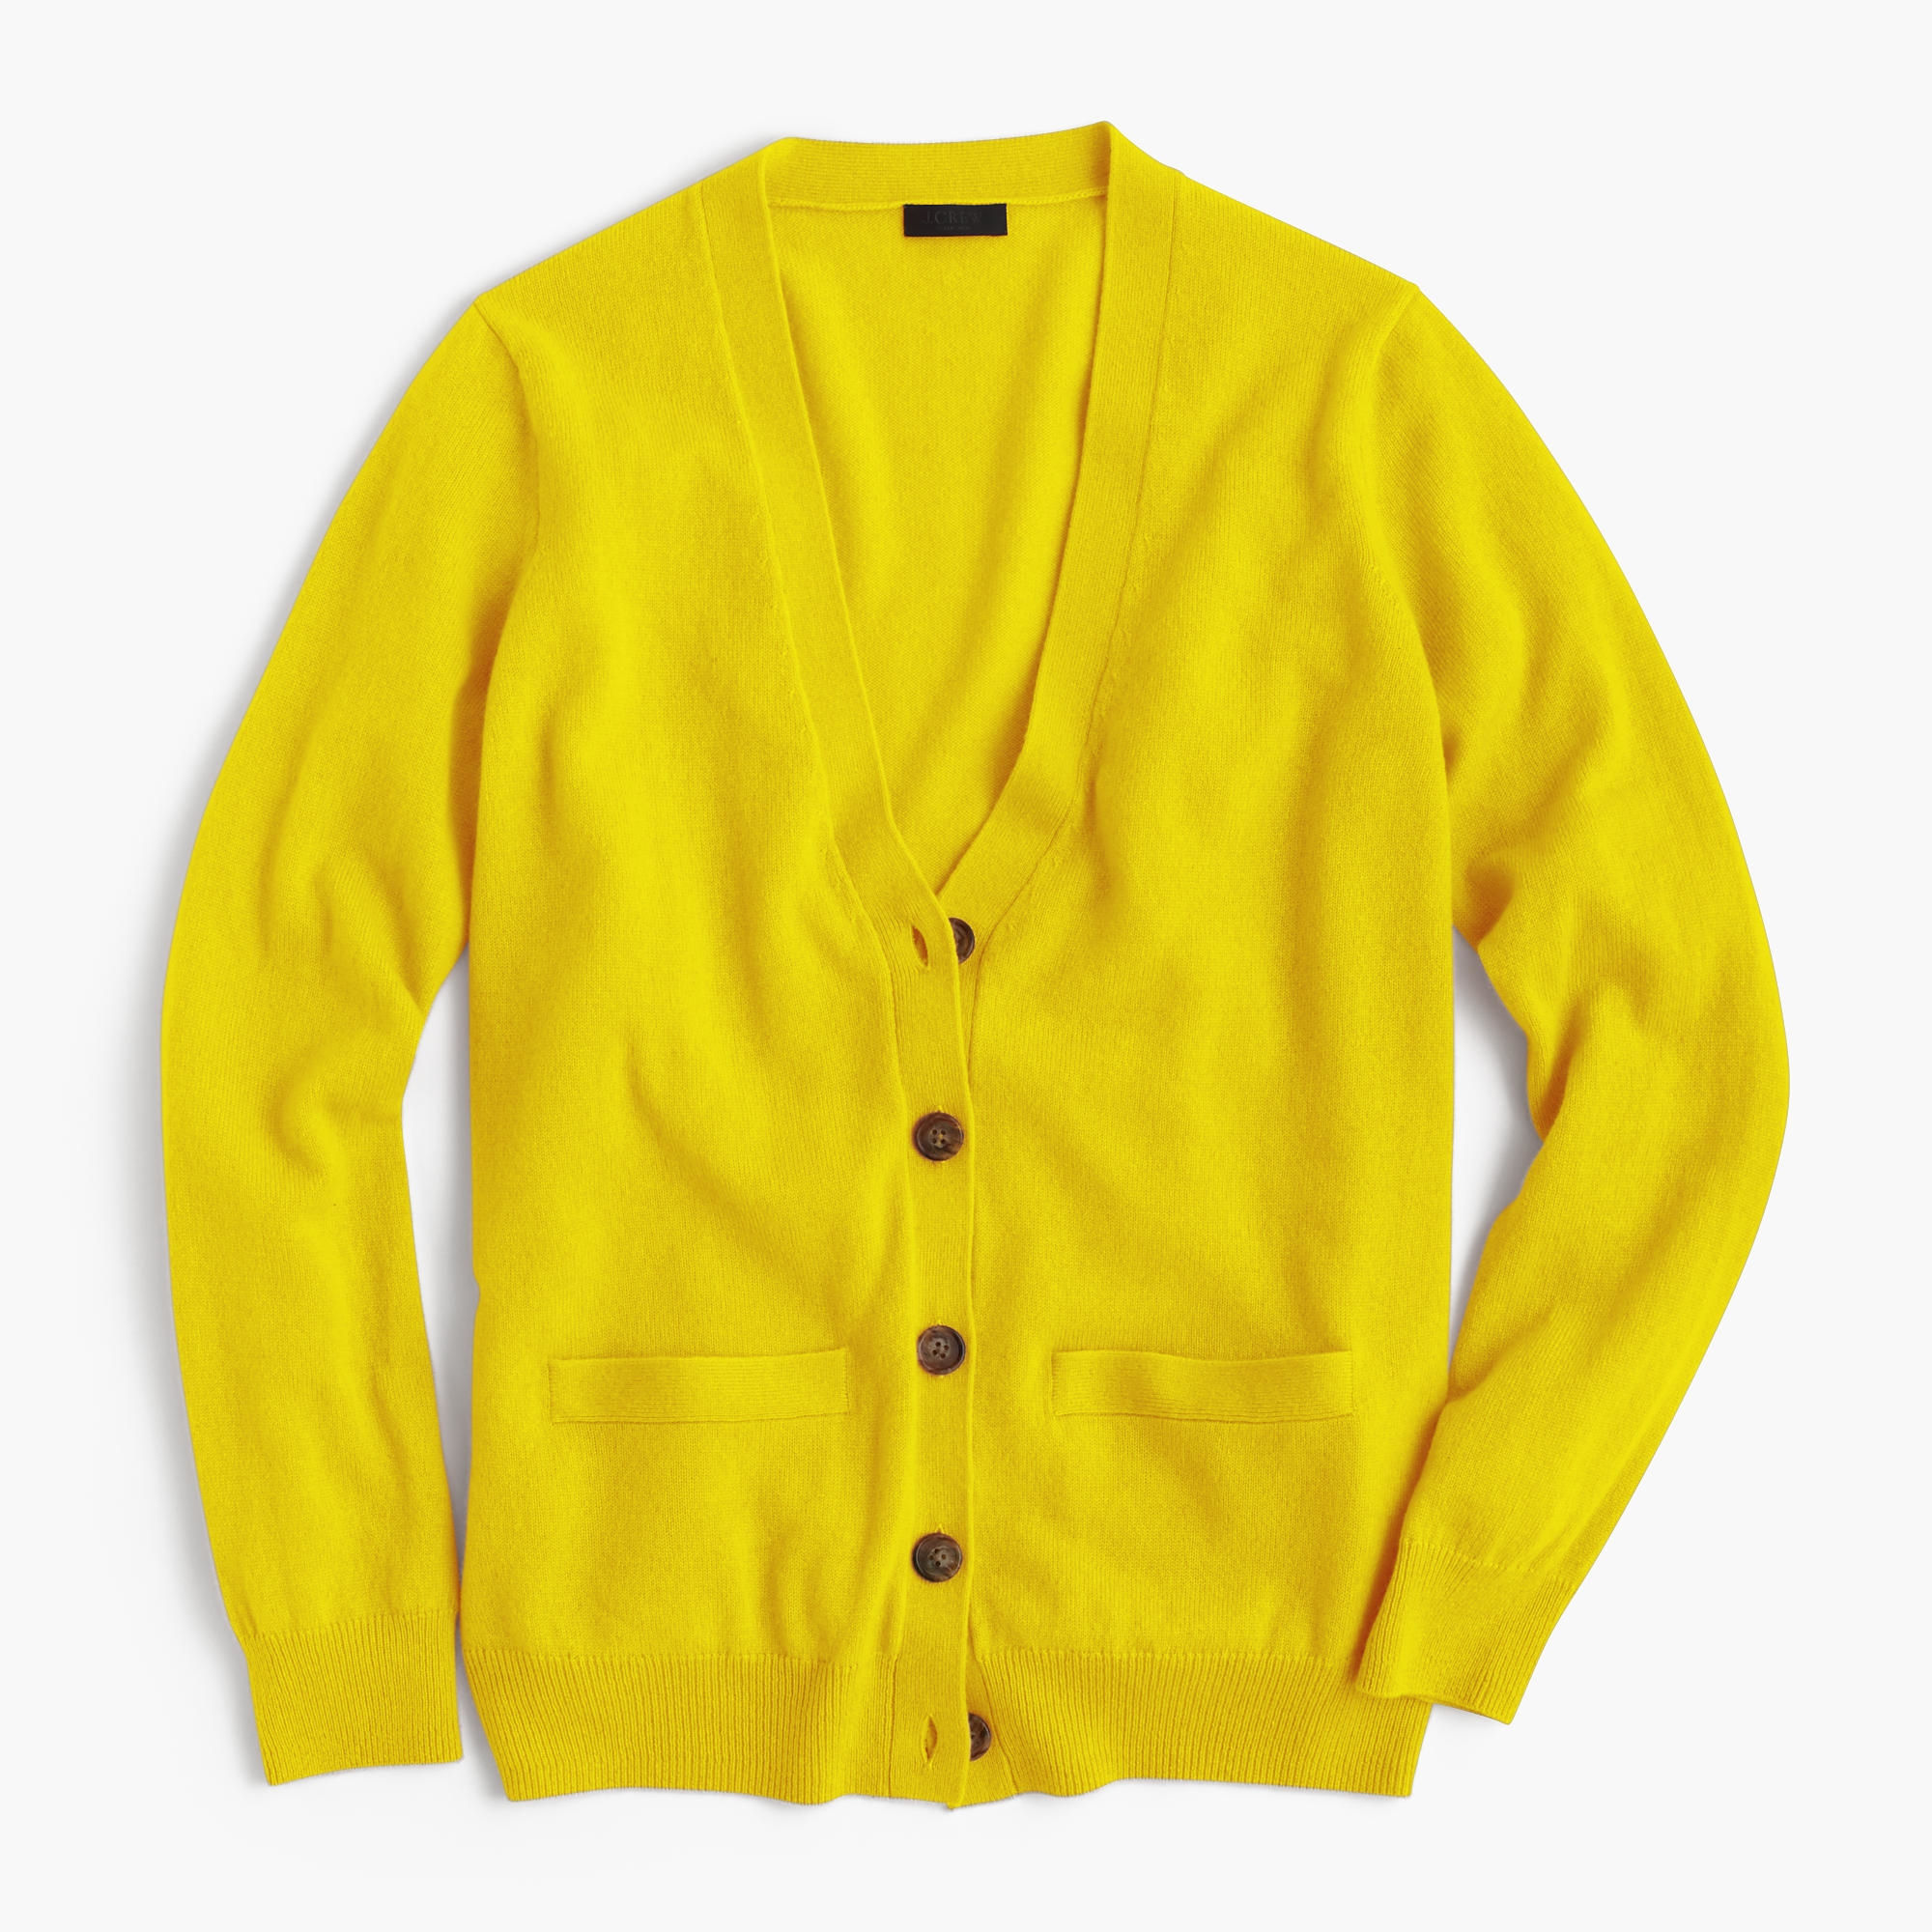 J.crew Italian Cashmere Boyfriend Cardigan Sweater in Yellow   Lyst